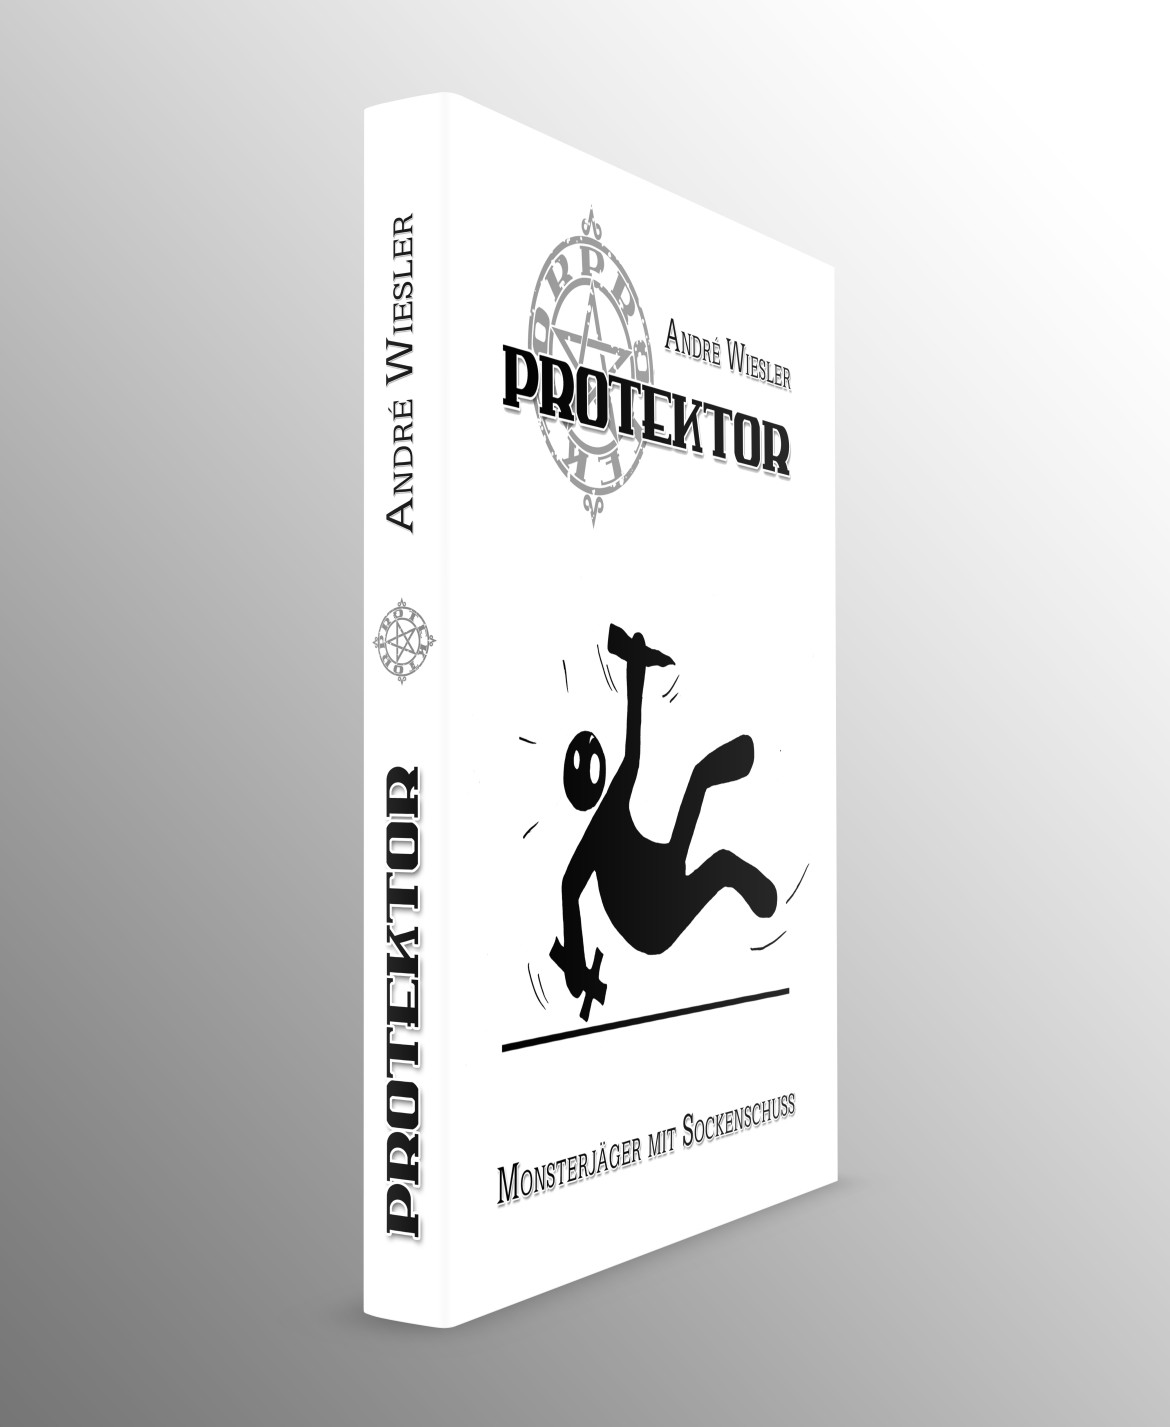 Protektor 3D Mockup v2 rendered